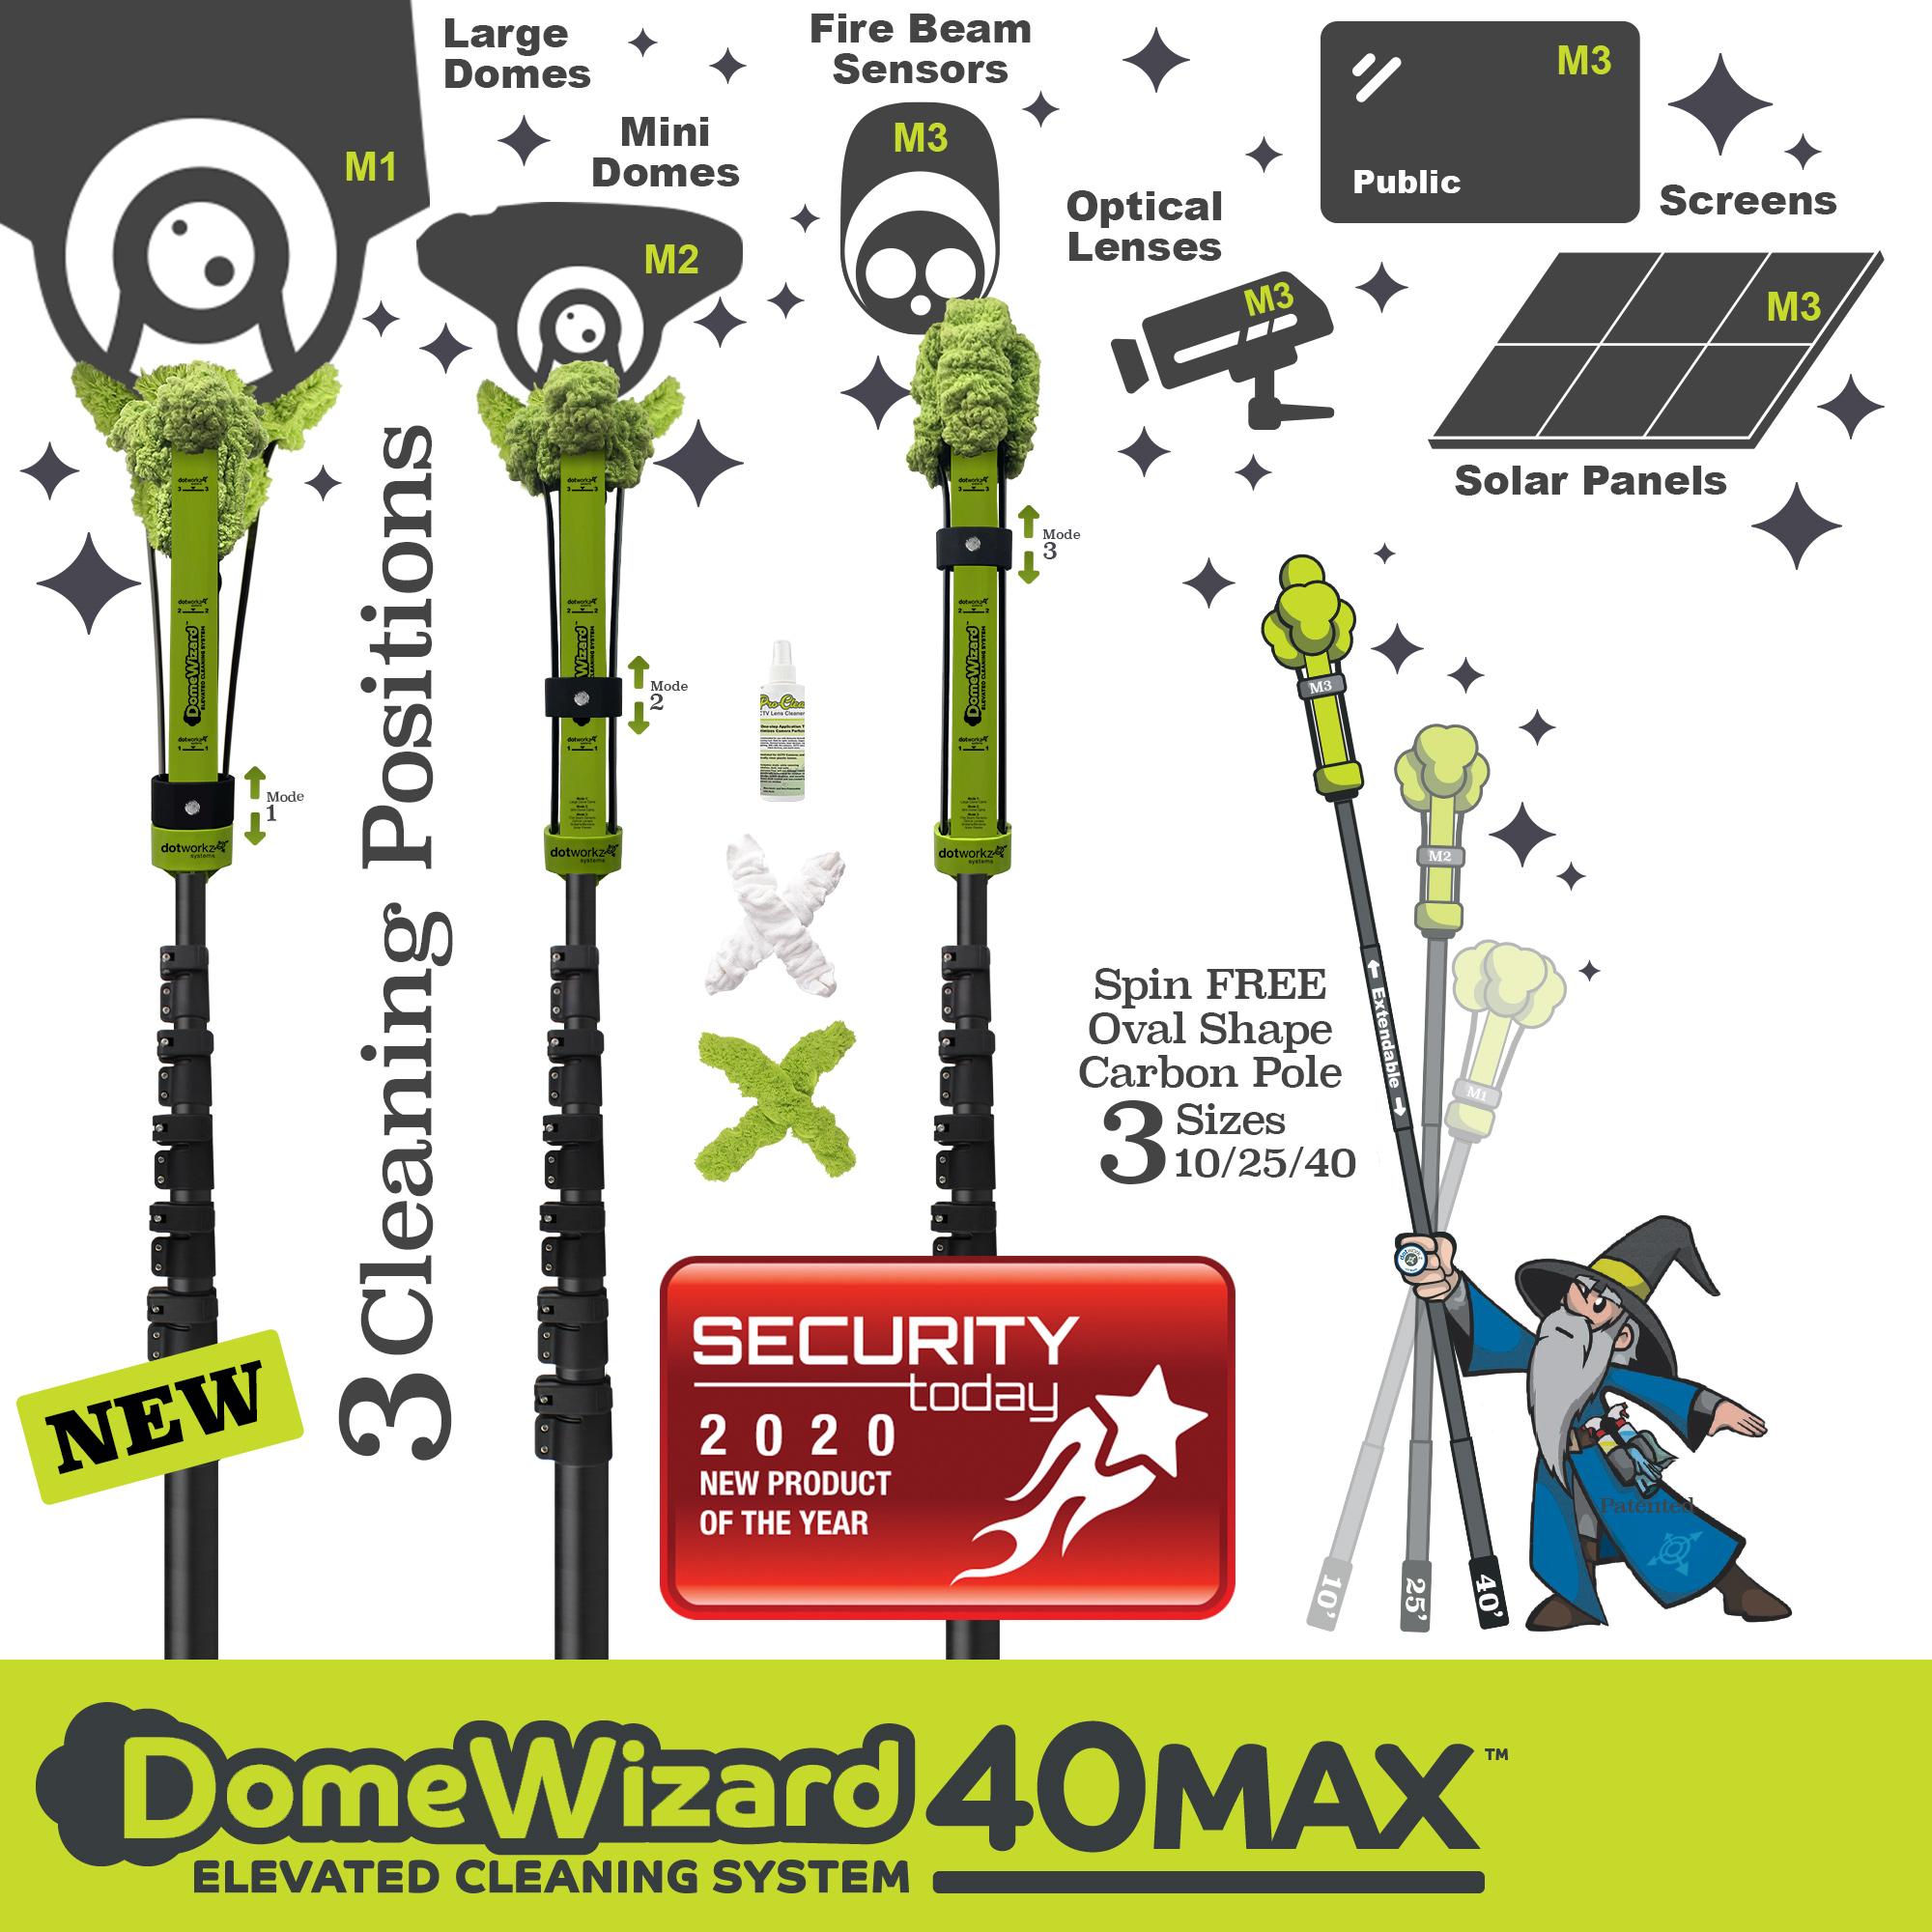 DomeWizard 40Max NPOY Award 2020